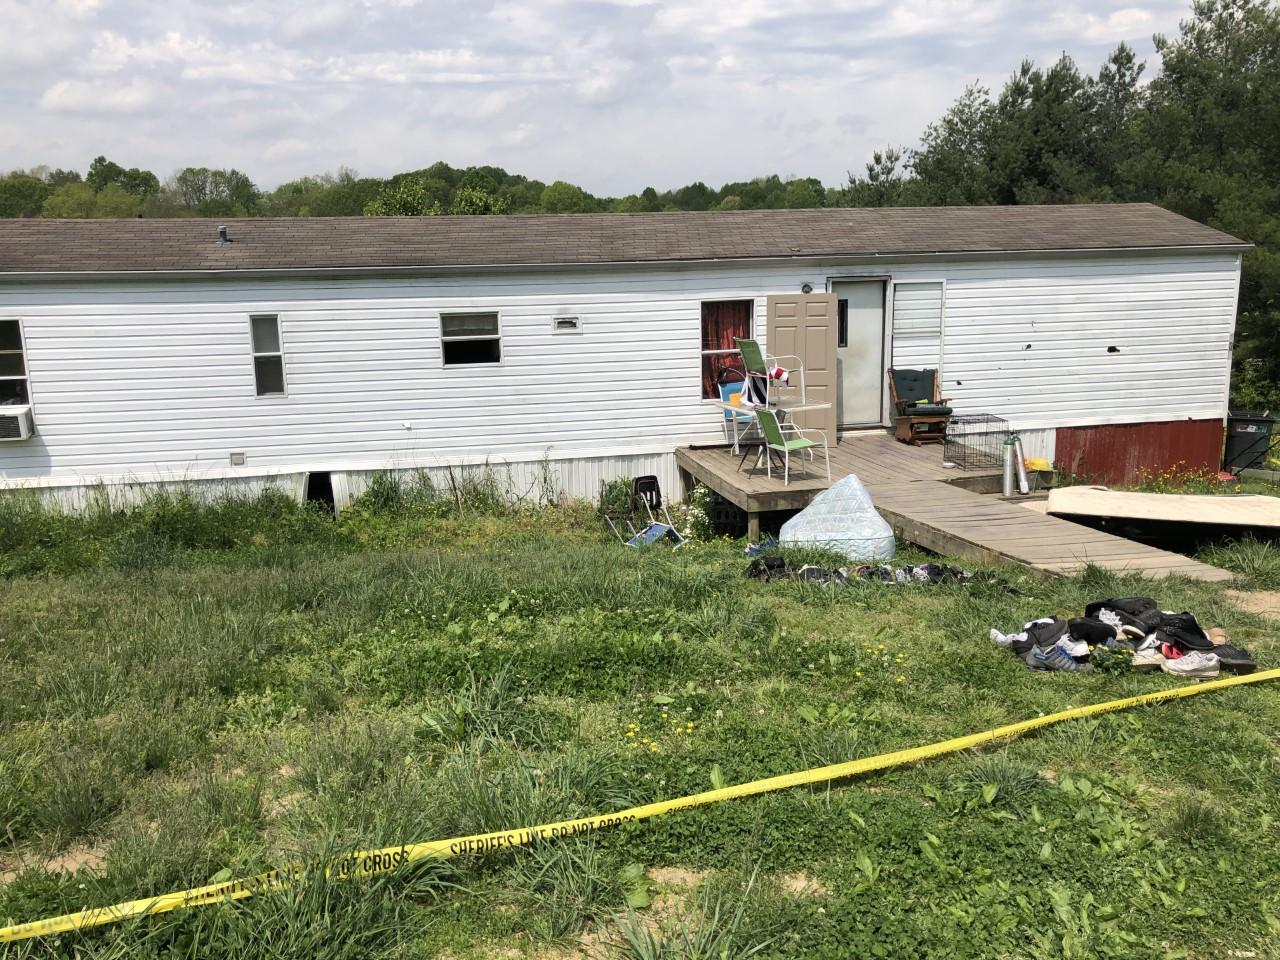 Sumner county homicides house_1556575232639.jpg.jpg